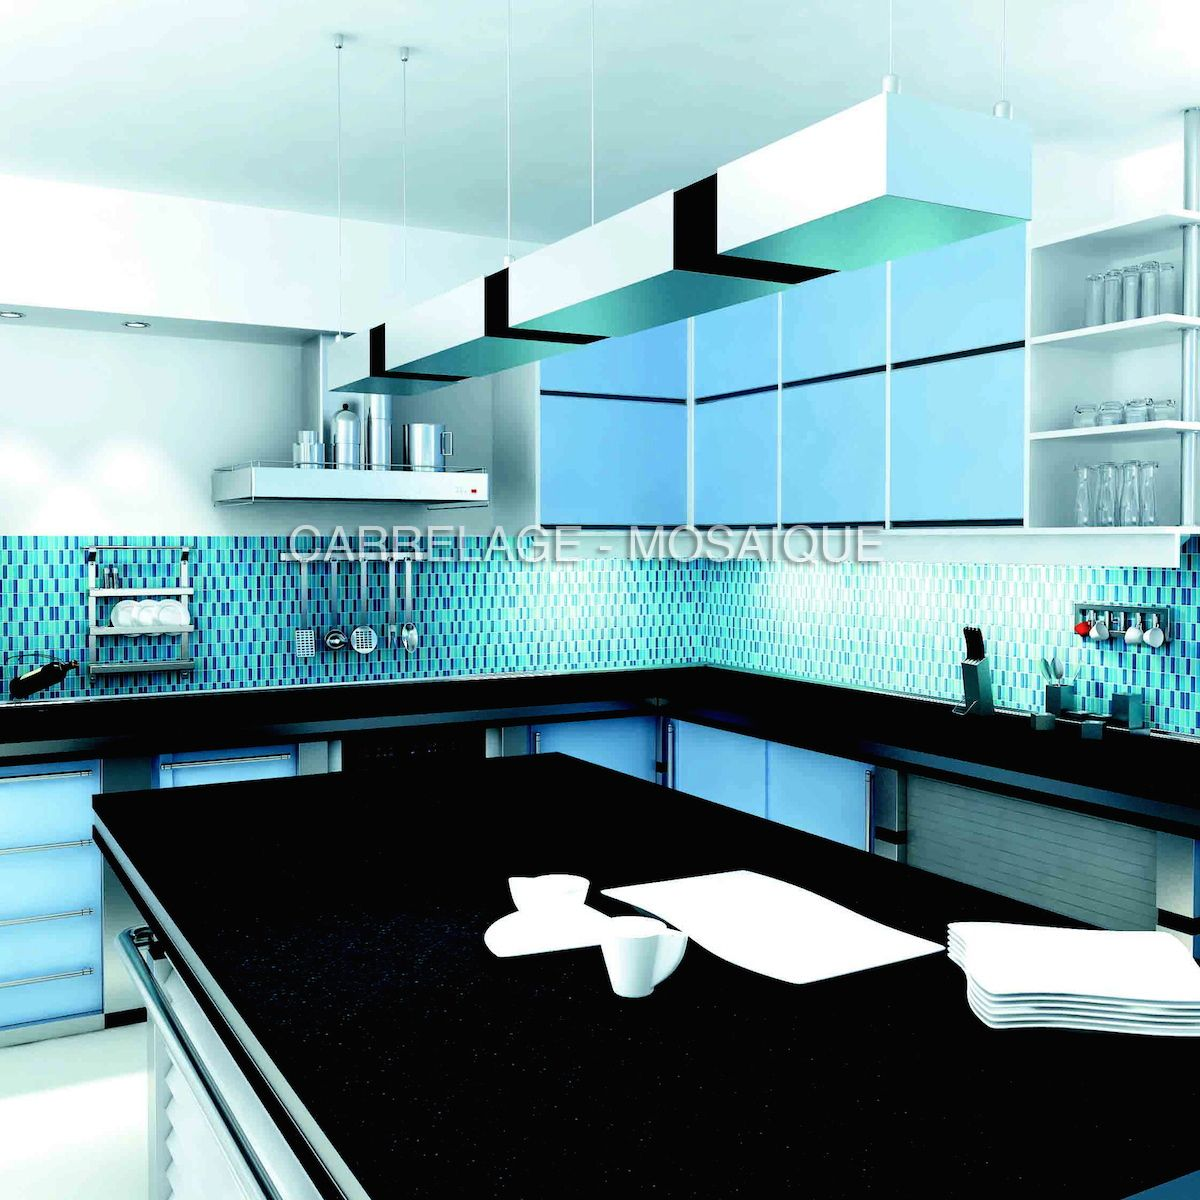 credence de cuisine en mosaique de verre modele skyrectangular